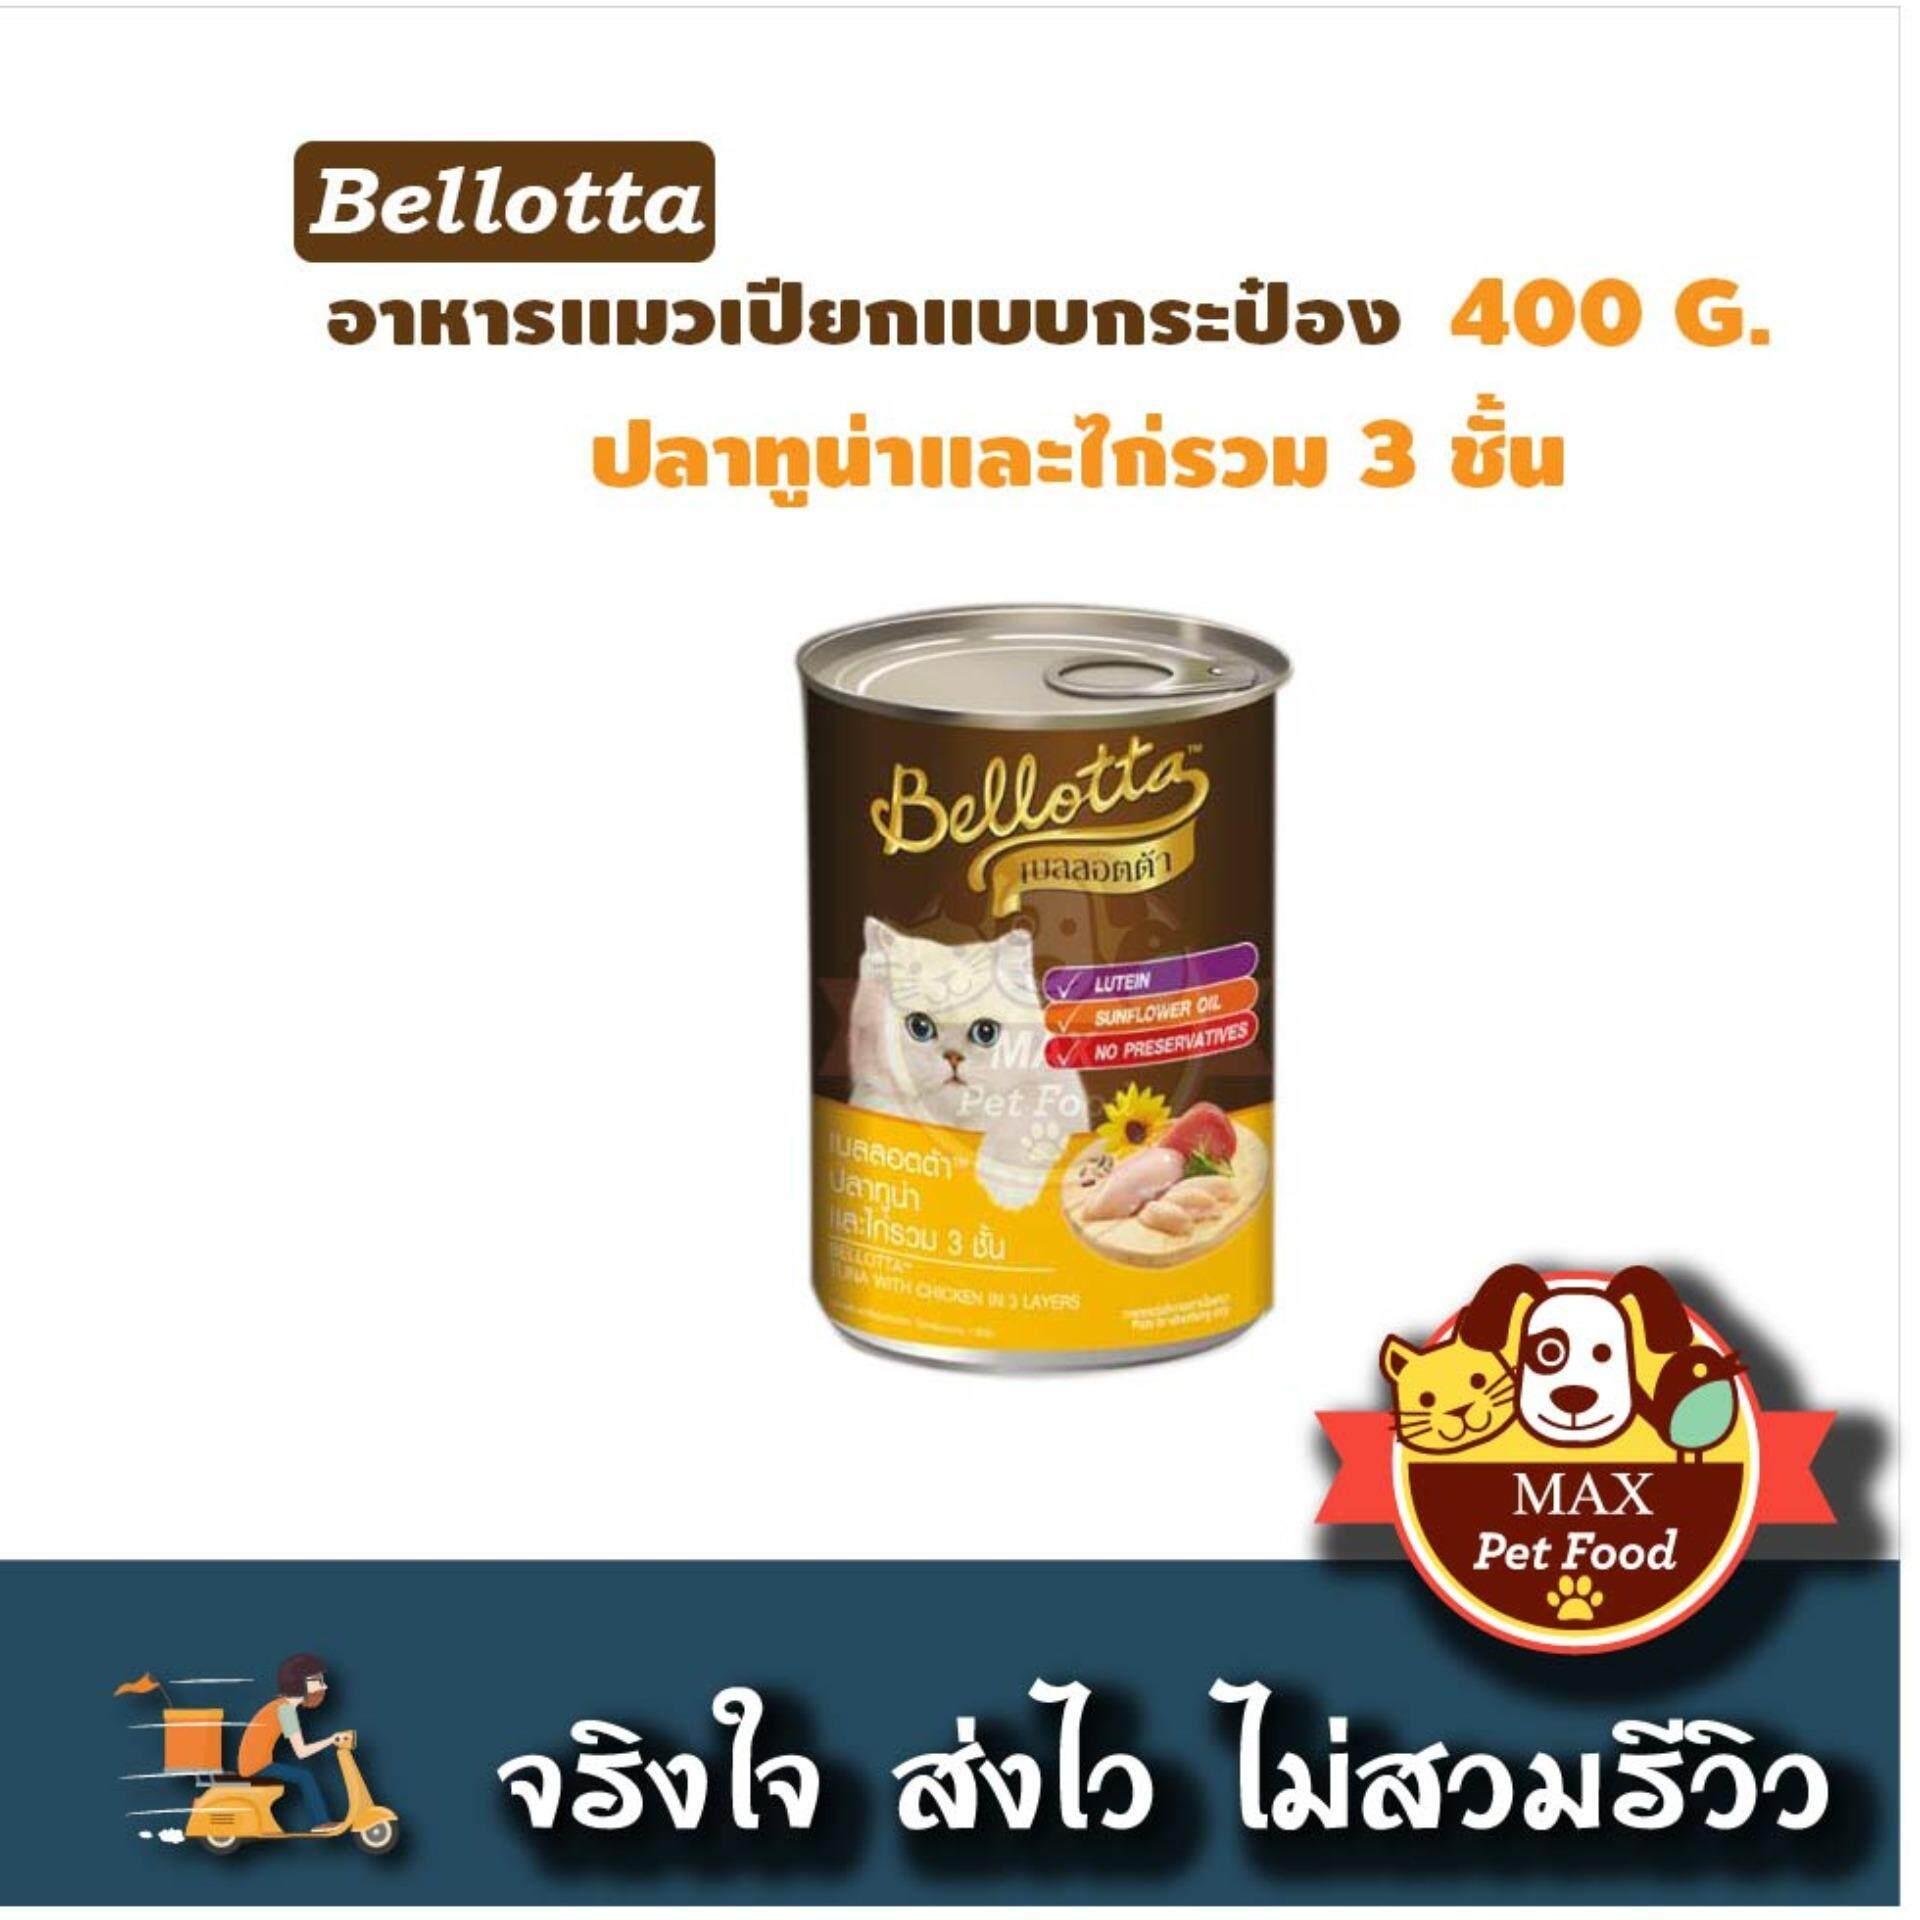 Bellotta Bellotta อาหารแมวแบบกระป๋อง ขนาด 400 กรัม แบ่งขาย 1 กระป๋อง By Maxpetfood.